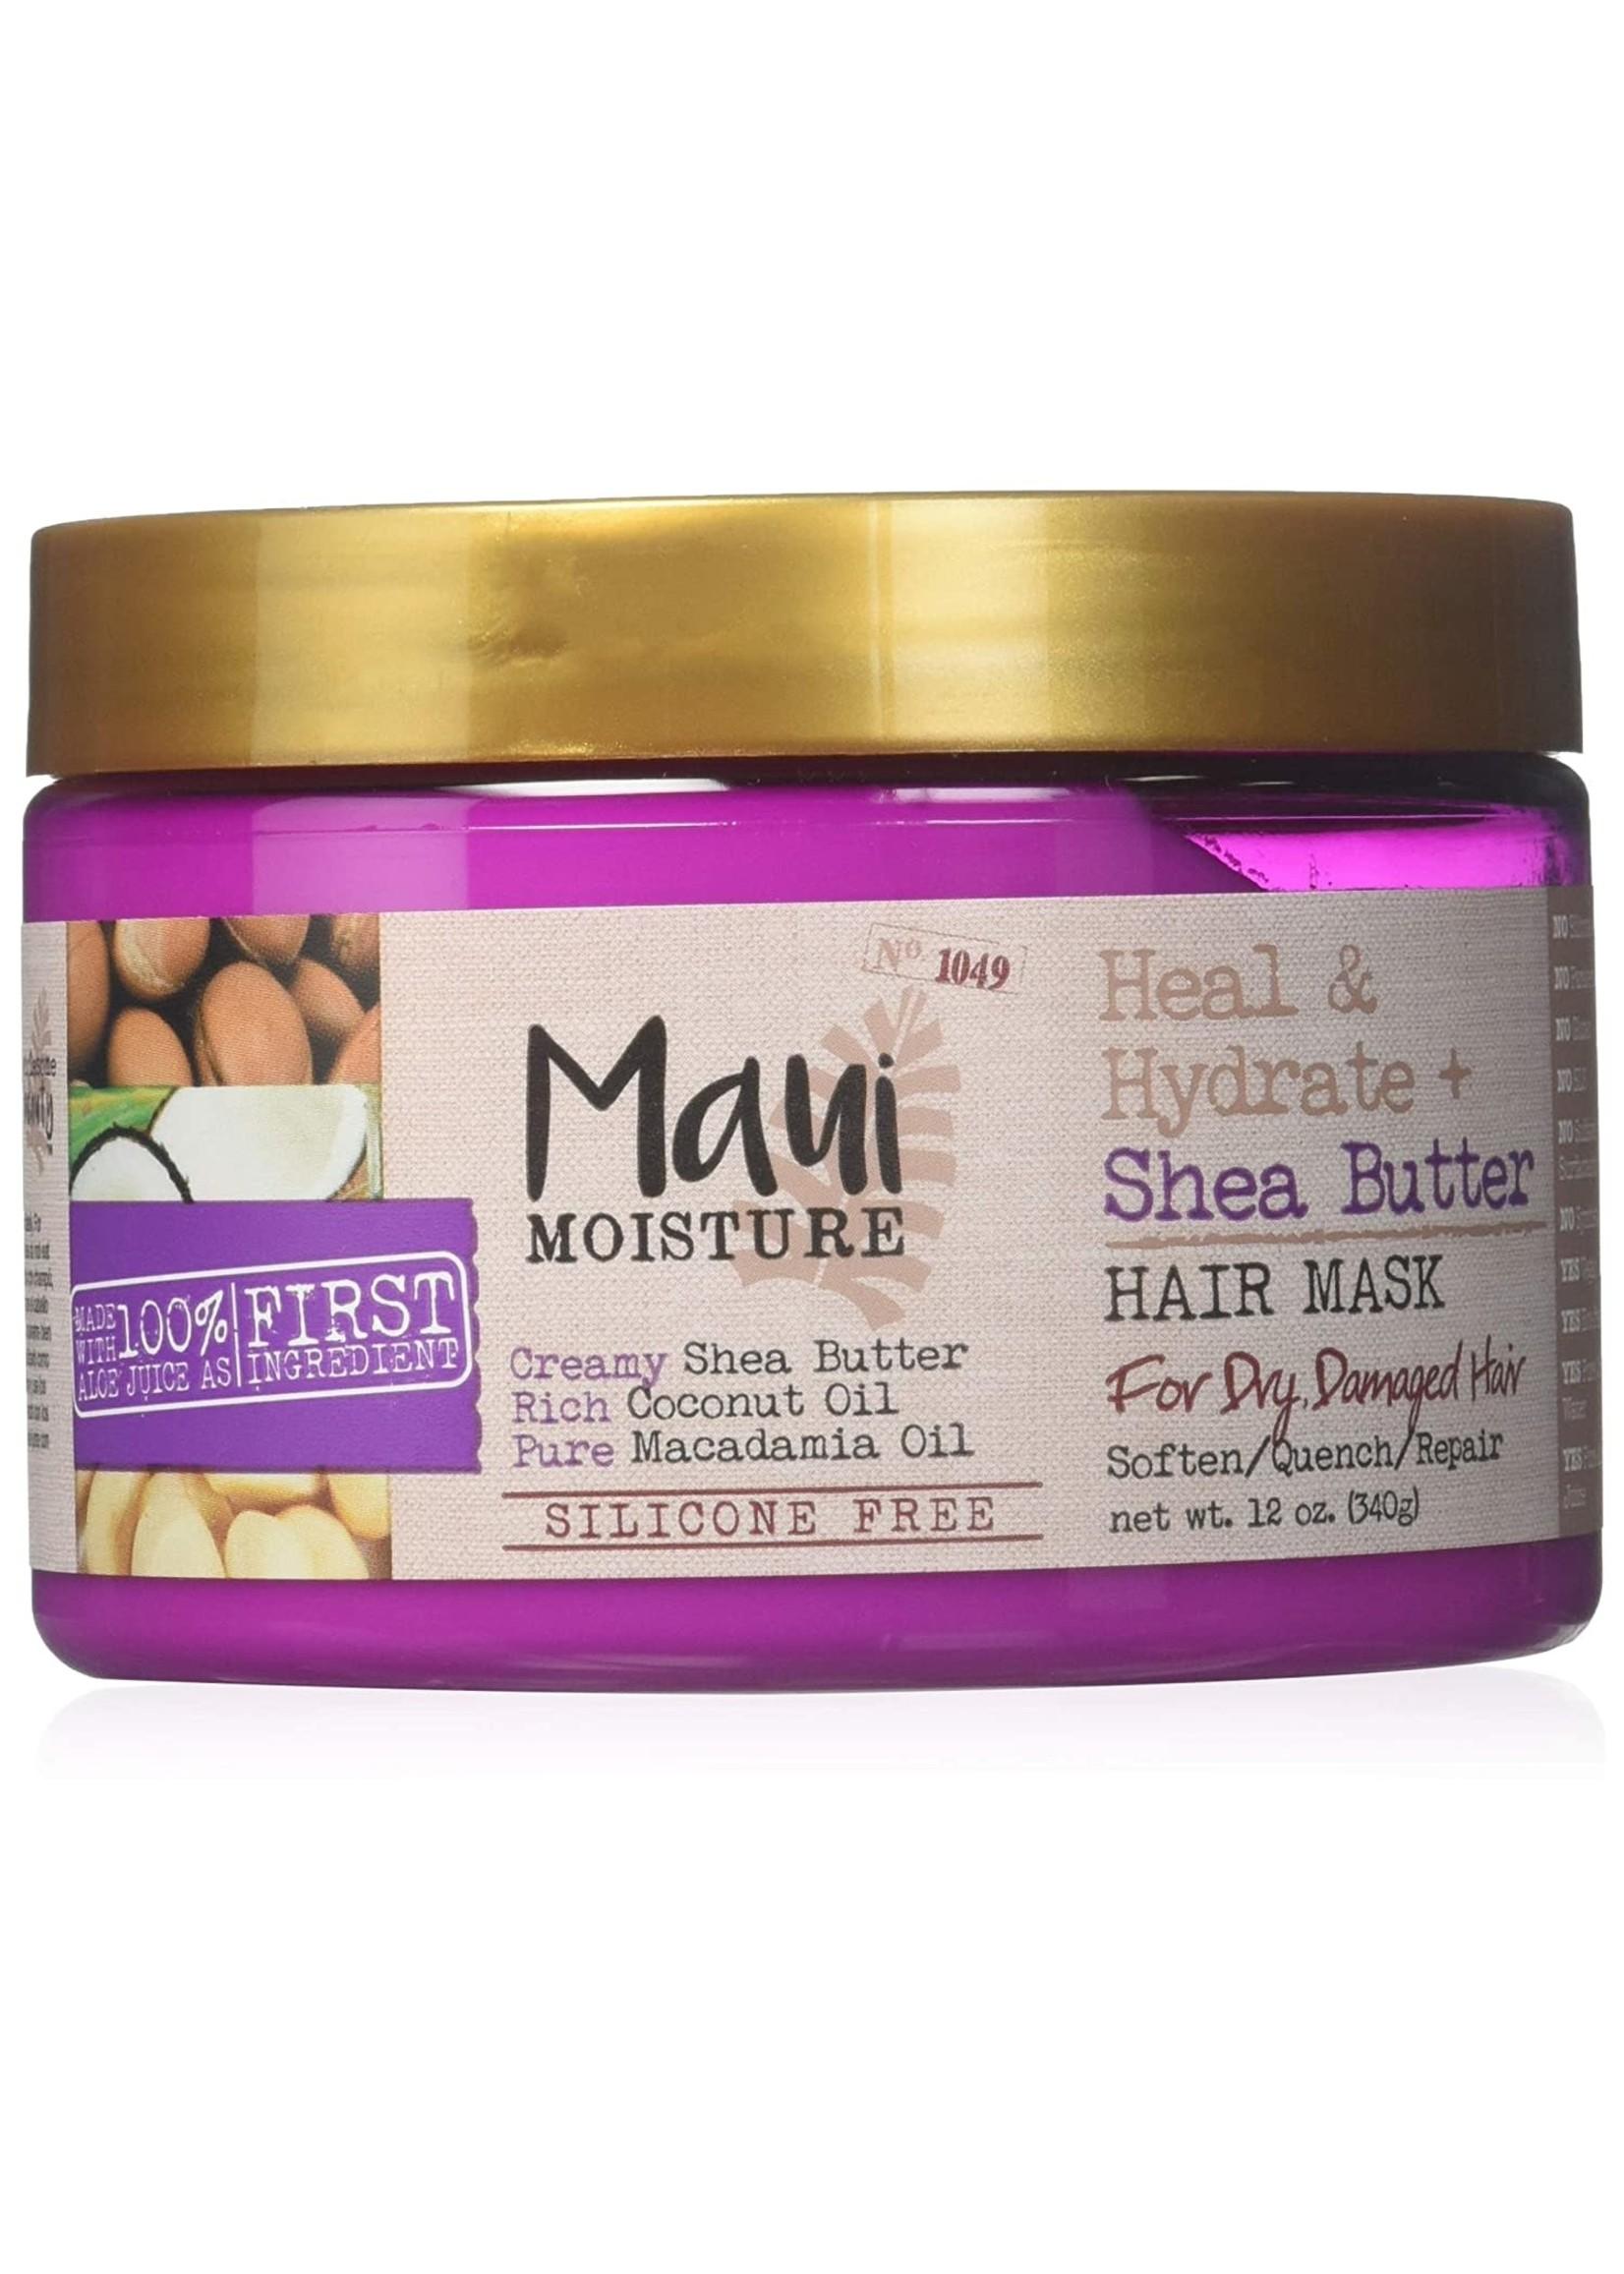 Maui Moisture Hair Care Shea Butter Hair Mask